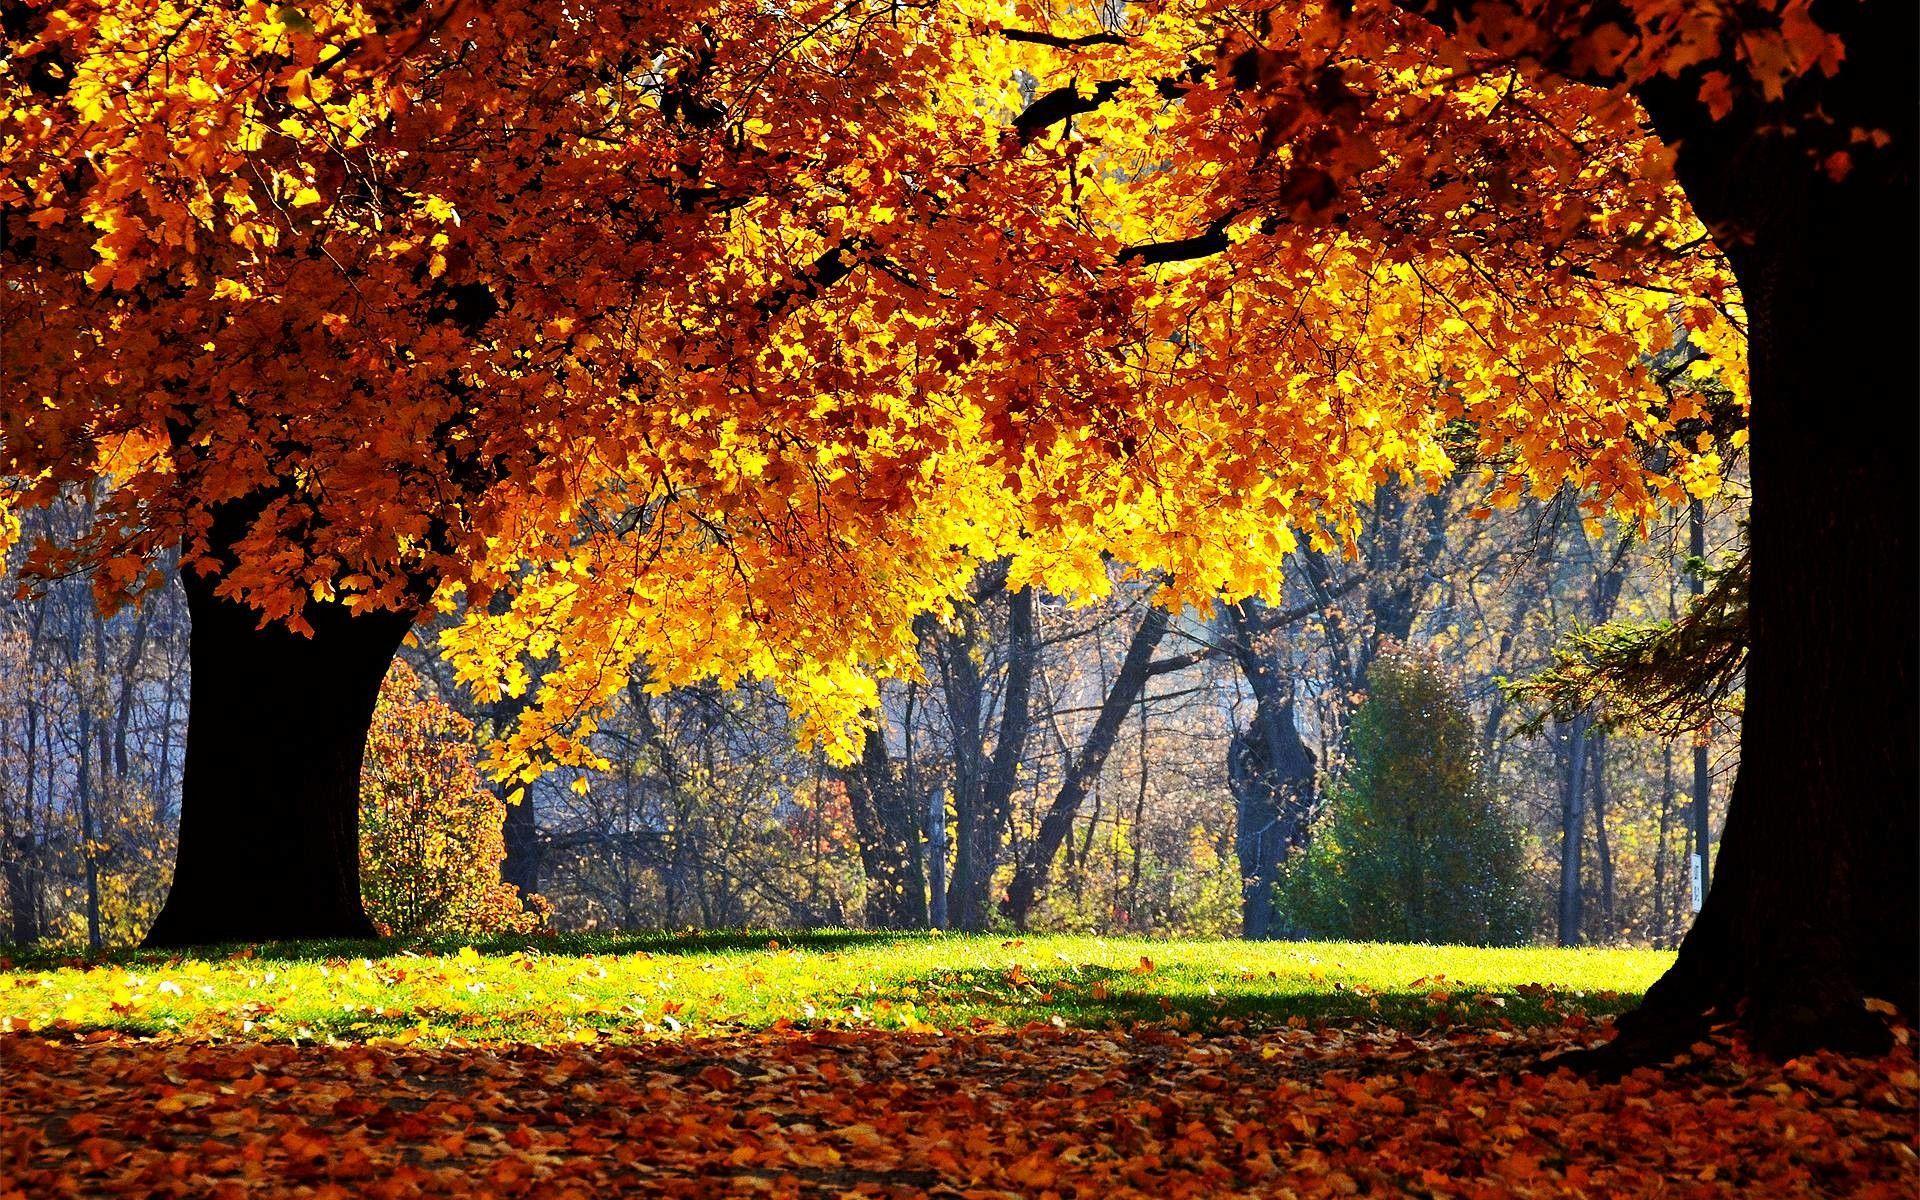 Autumn Computer Wallpapers - Top Free Autumn Computer Backgrounds -  WallpaperAccess